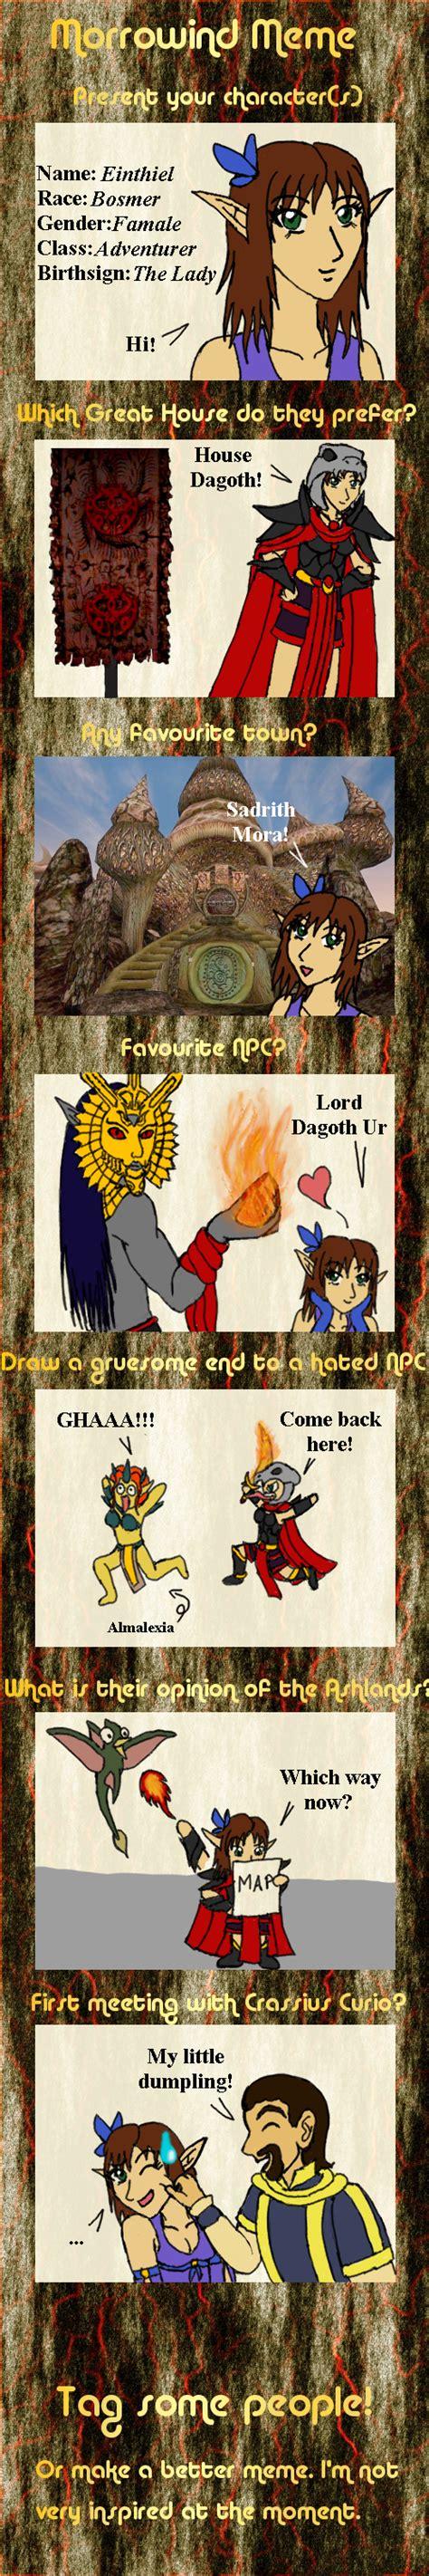 Morrowind Memes - morrowind meme einthiel by gothawolf on deviantart